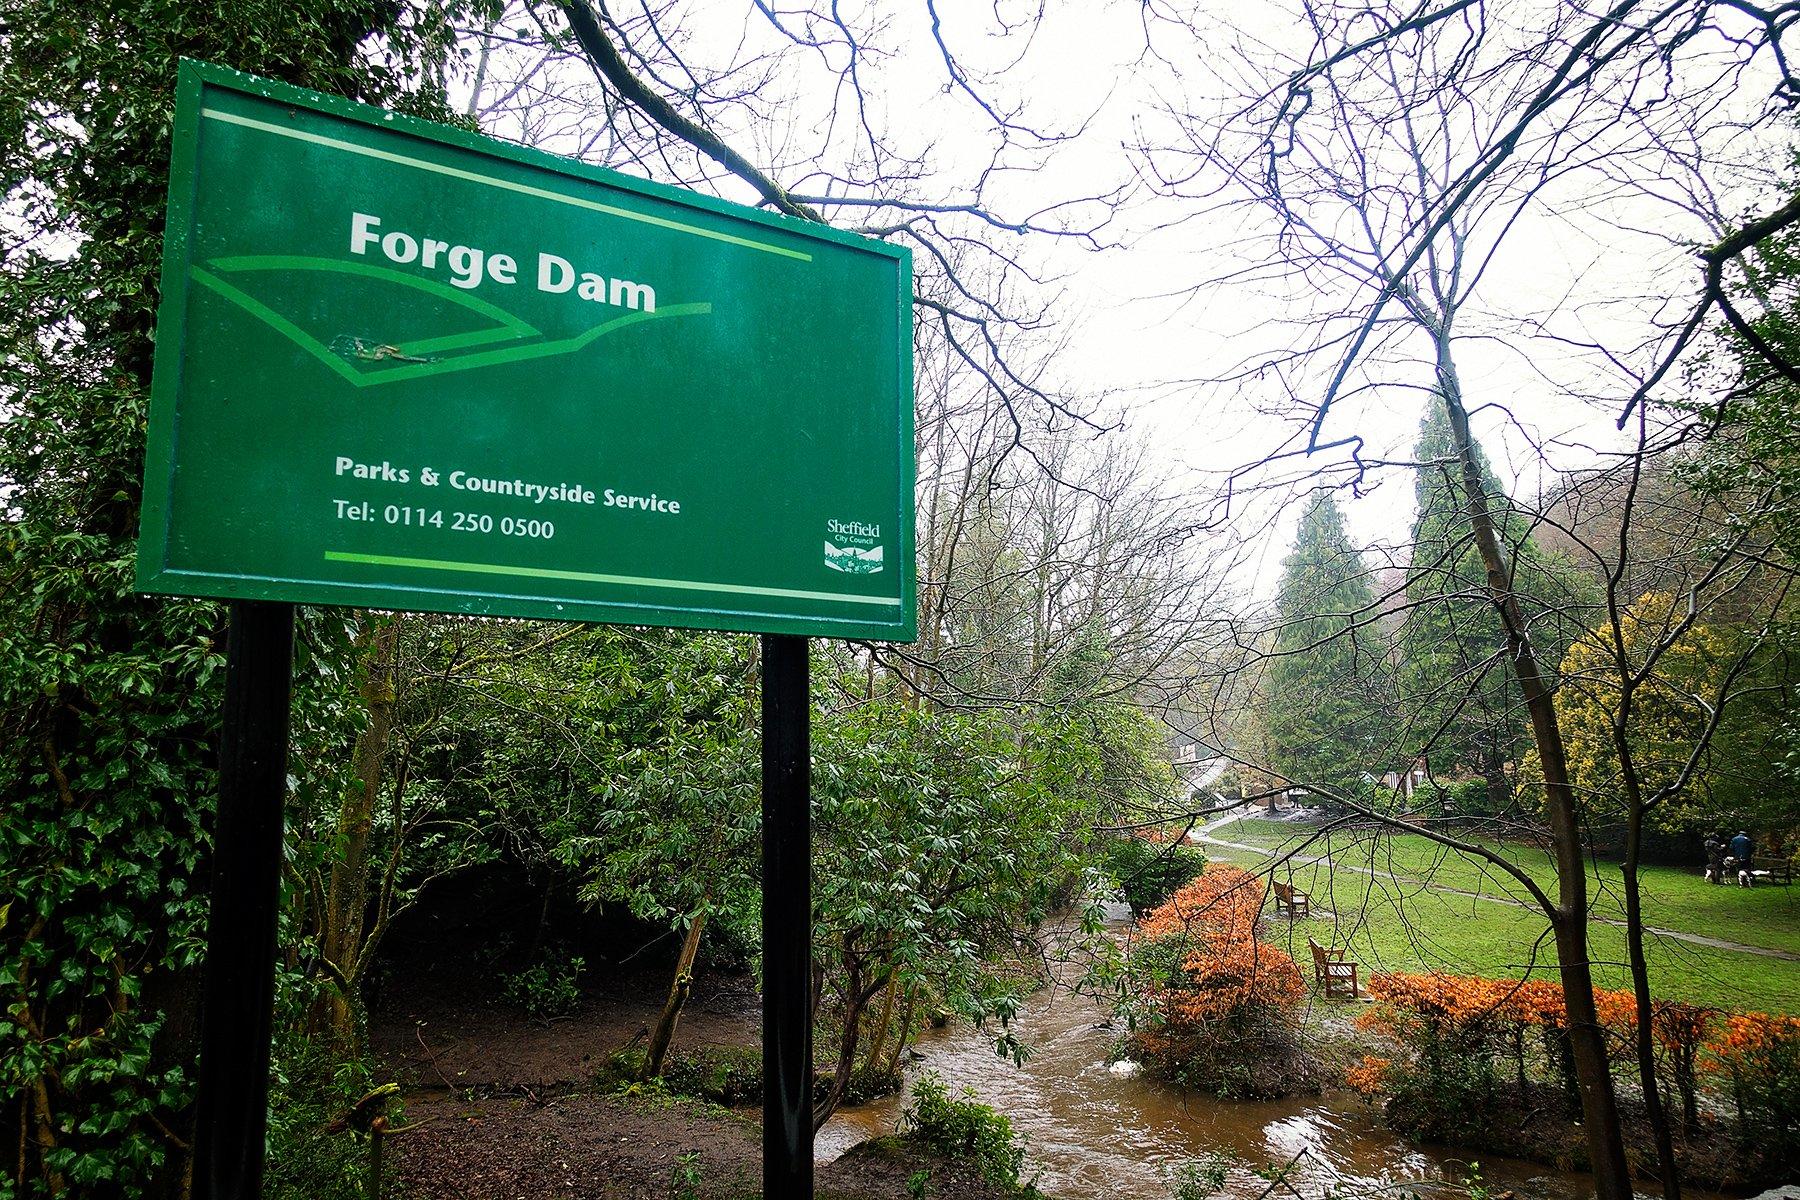 Forge Dam in Sheffield walk